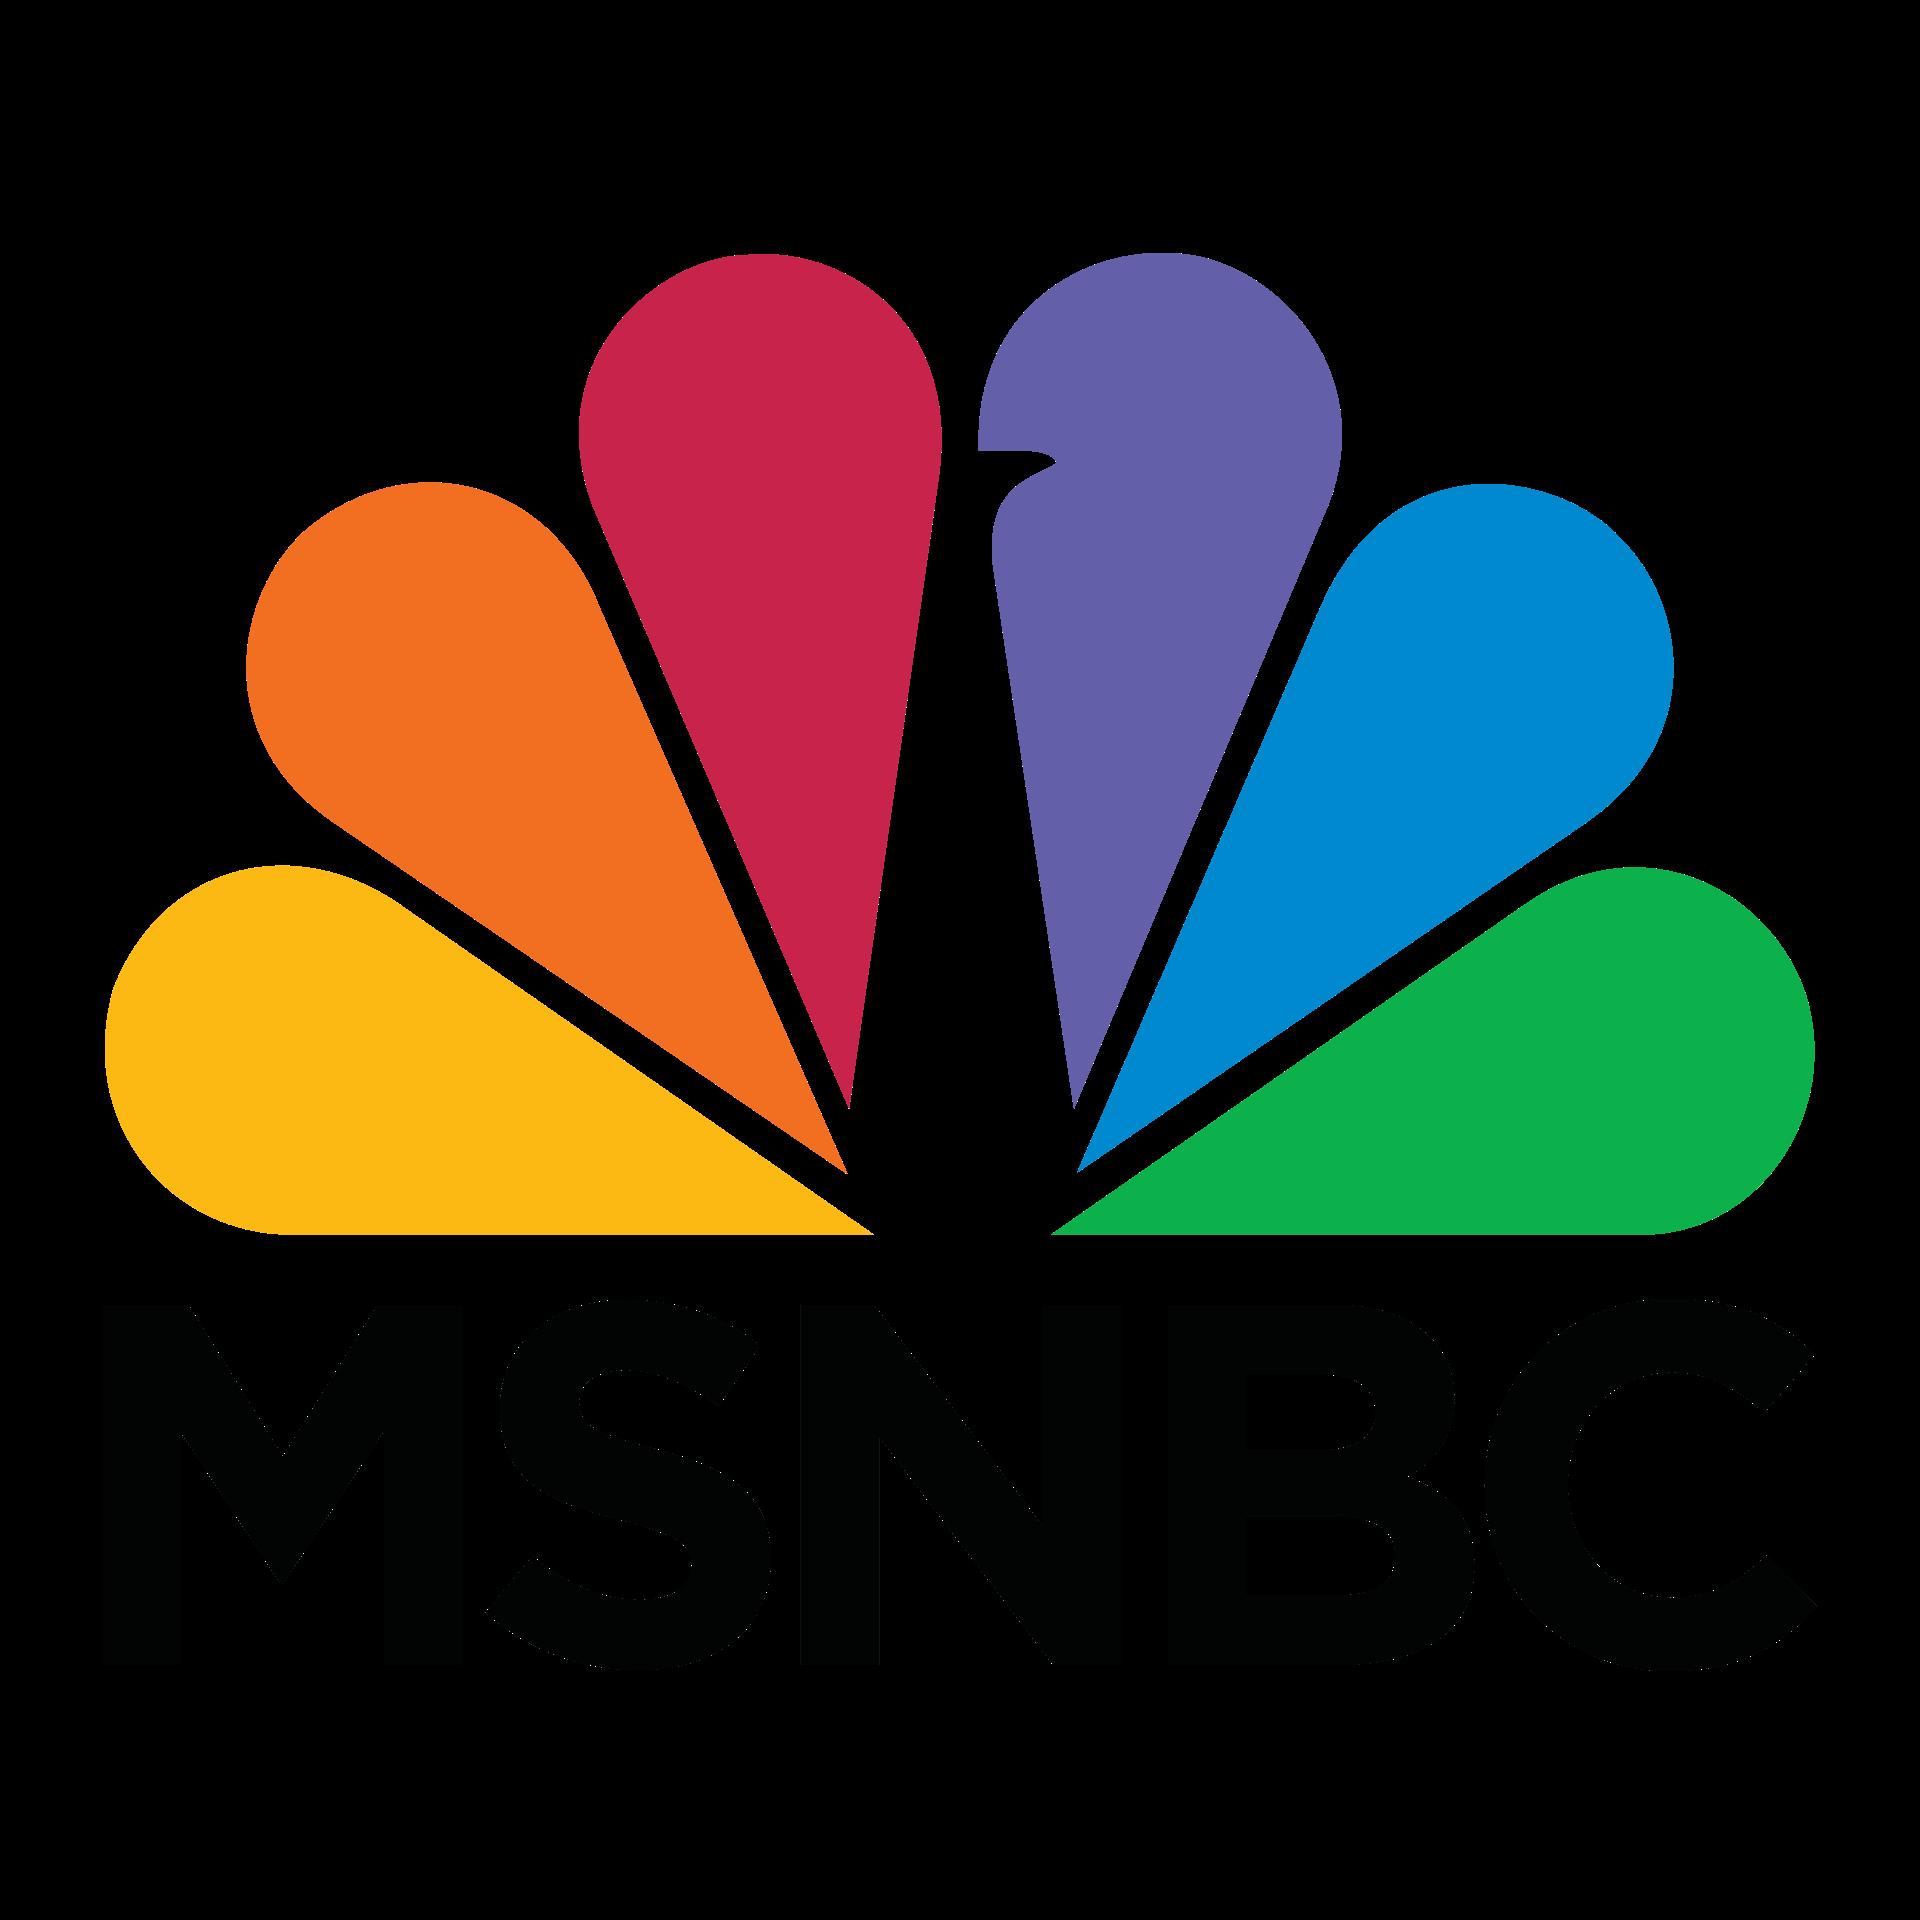 logo msnbc png transparent logo msnbcpng images pluspng